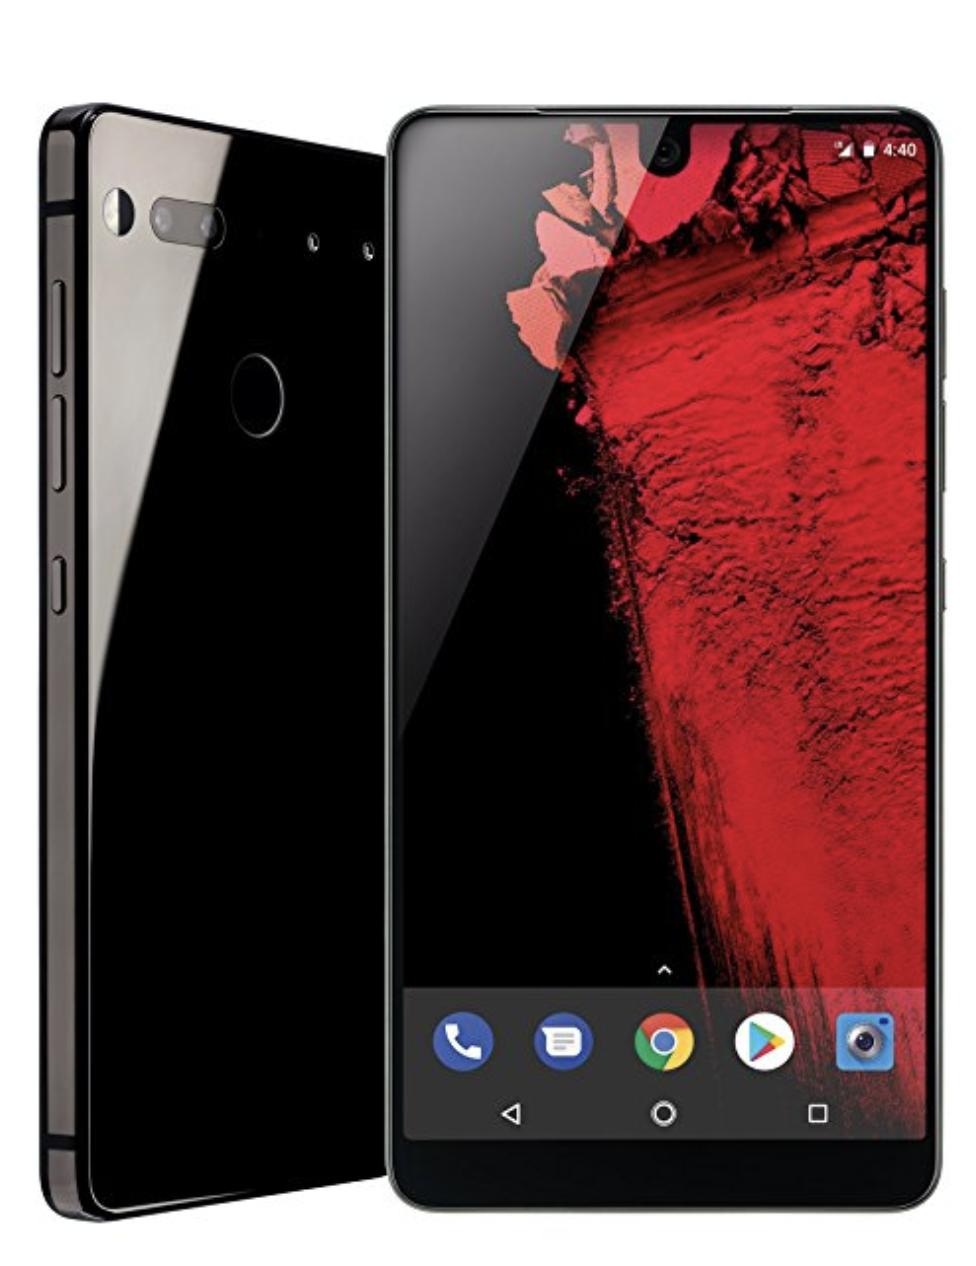 Essential Phone in Black Moon – 128 GB Unlocked - Amazon Used - Both Titanium and White $271.99